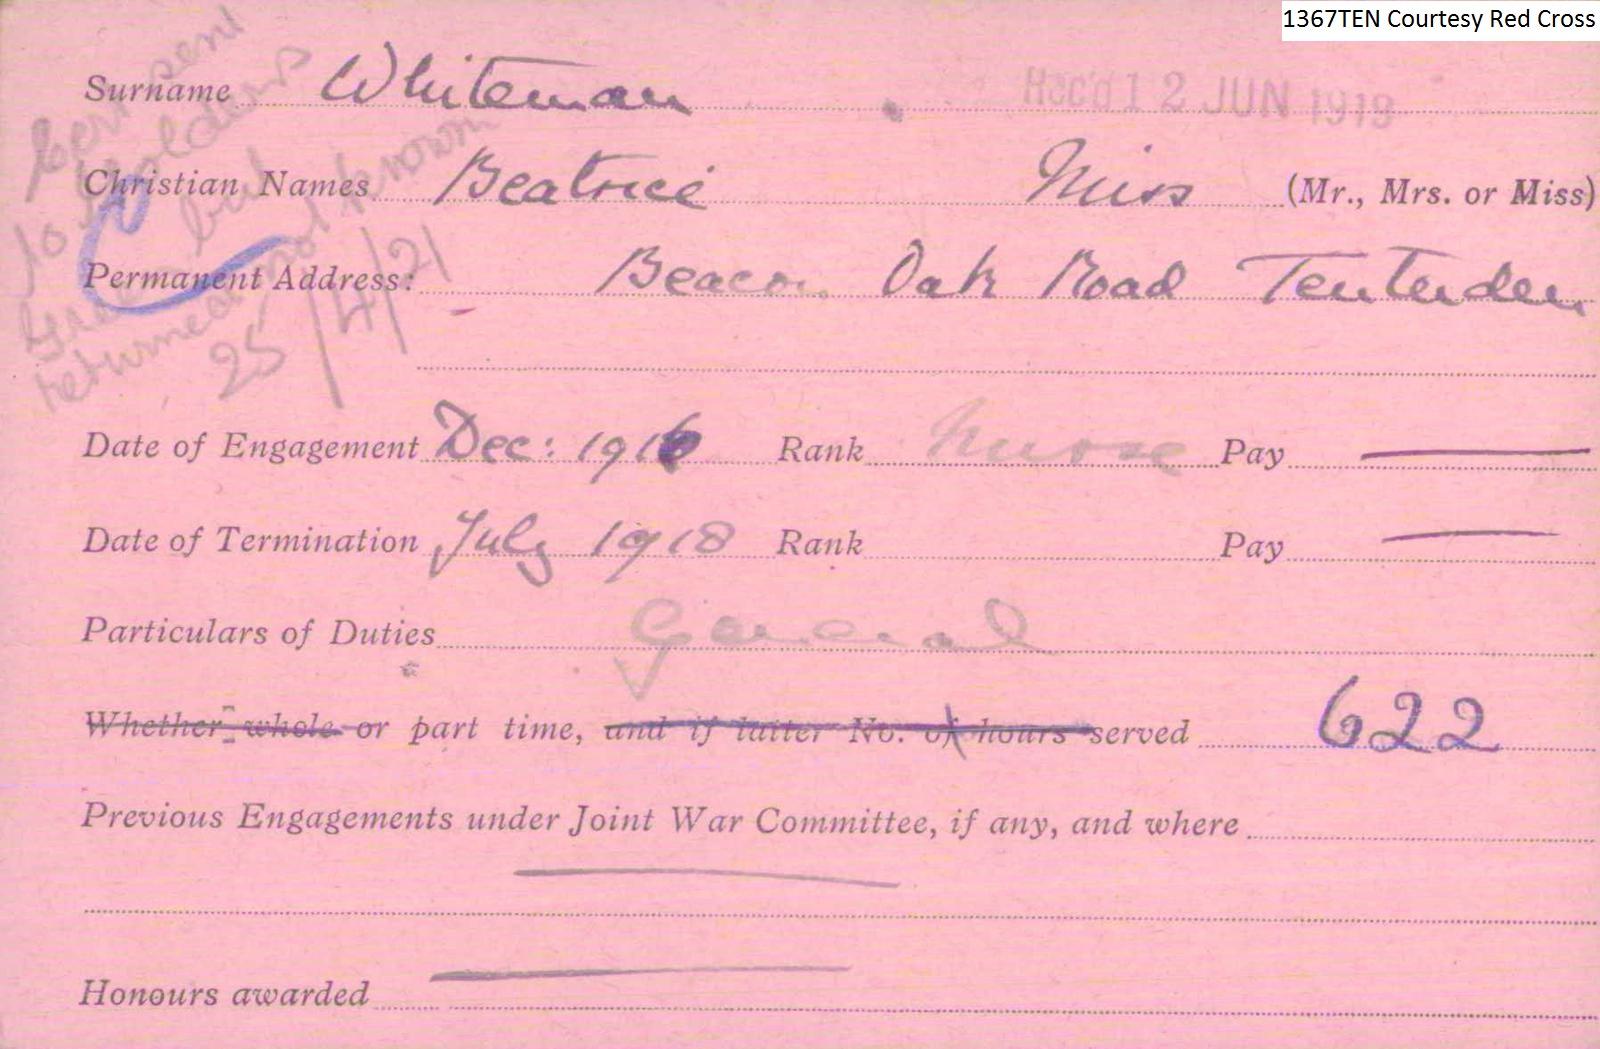 Miss Beatrice Whiteman